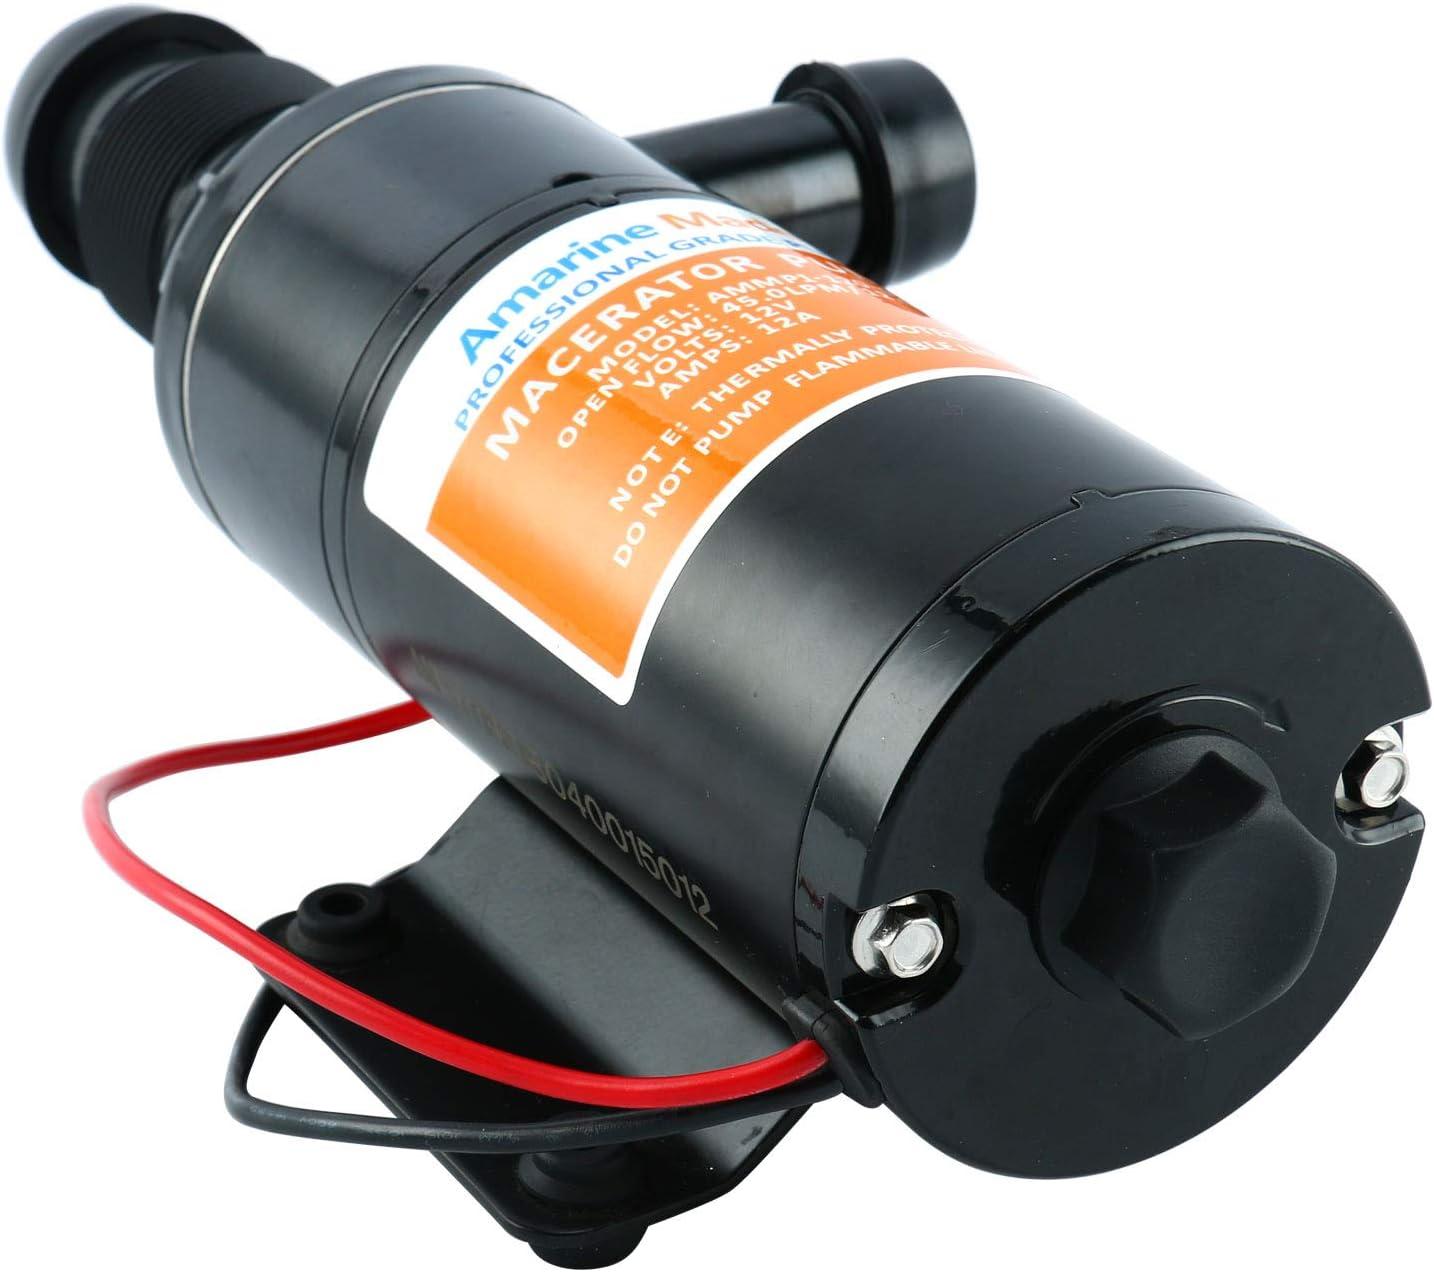 Amazon.com: Amarine - Bomba de agua para desagüe de 12 V ...